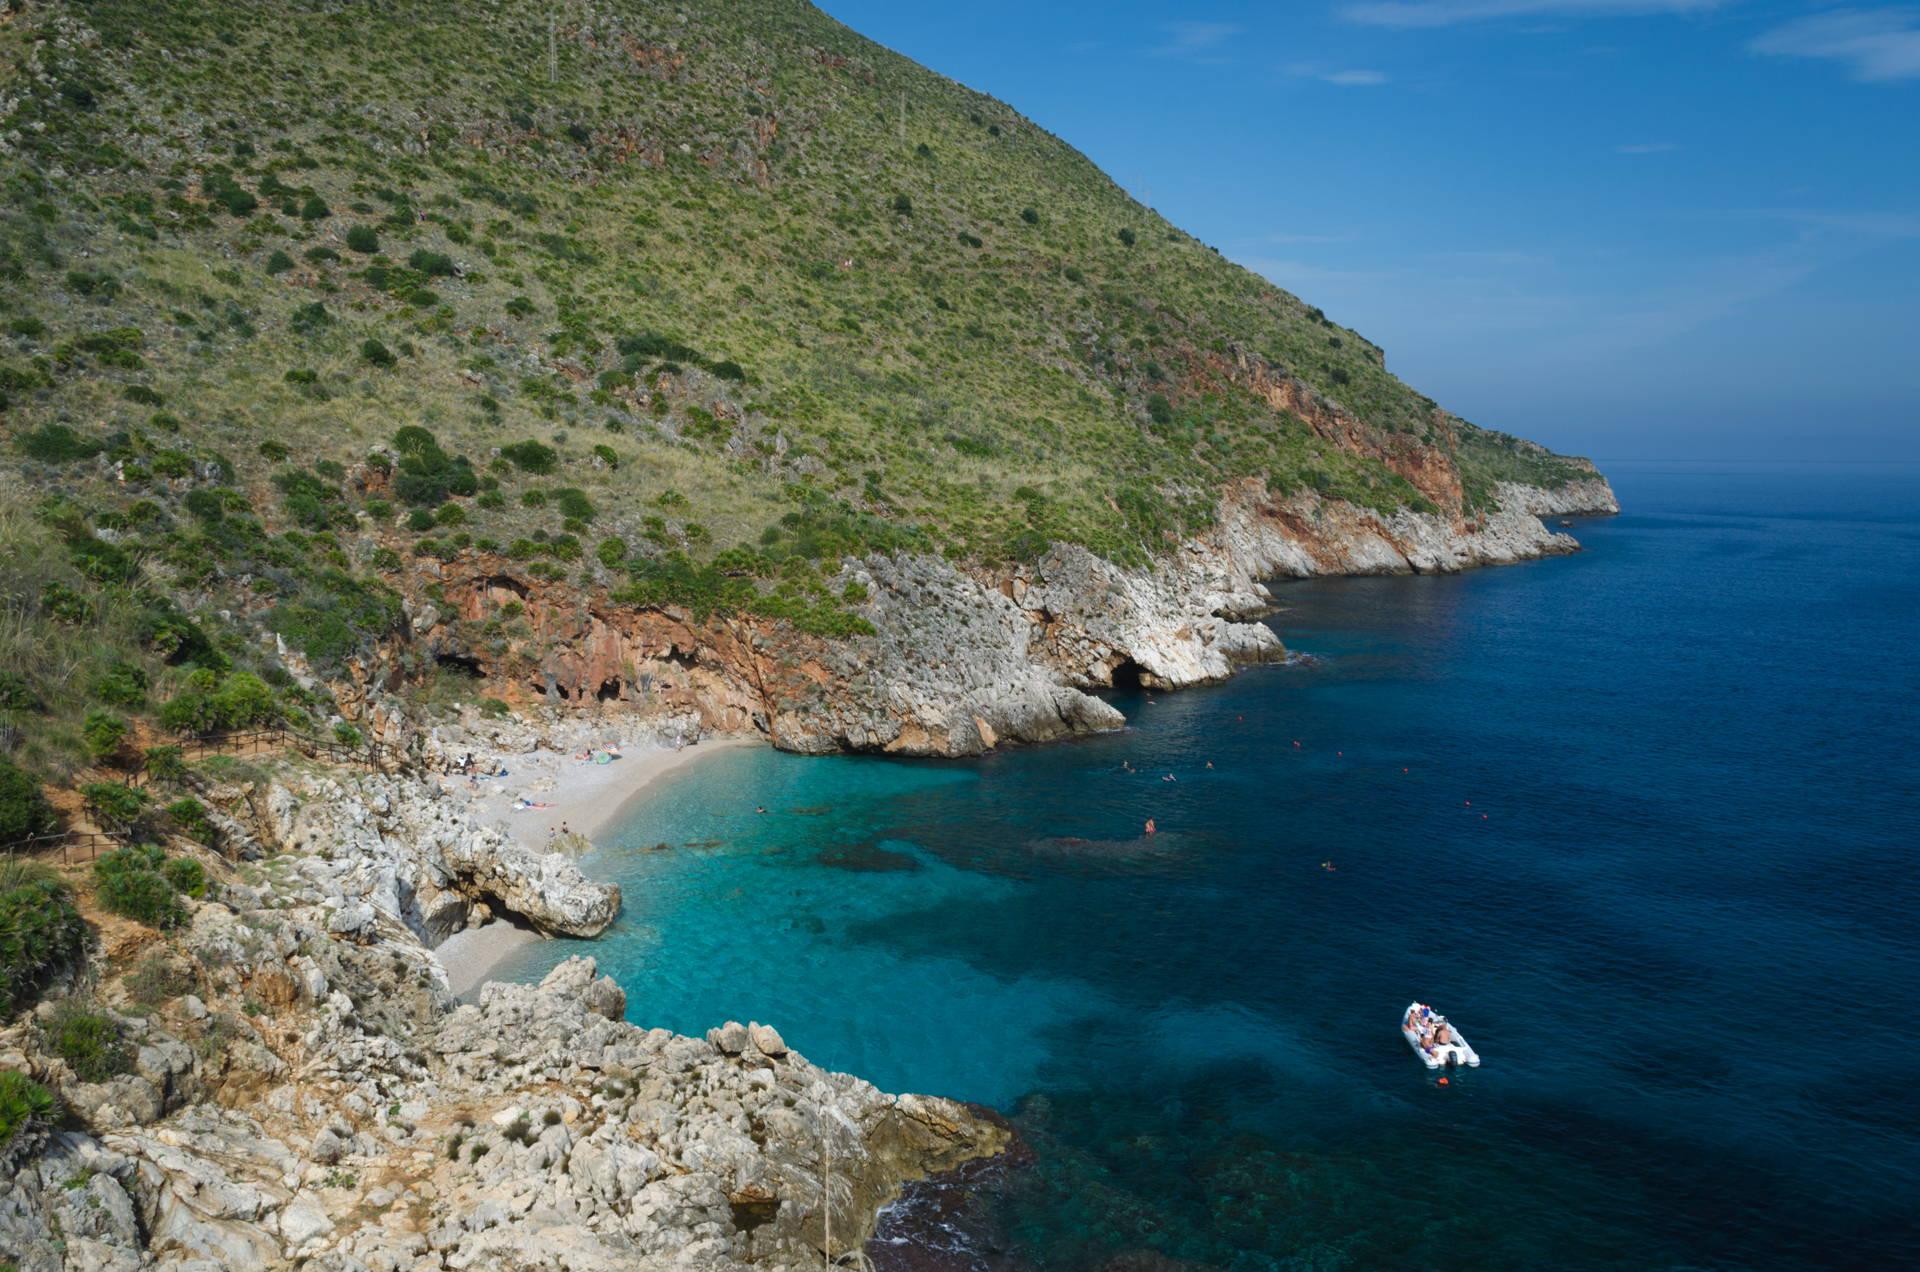 cala capreria, bay capreria, capreria, zingaro capreria, zingaro nature reserve, zingaro nature reserve beaches, best beach of zingaro nature reserve, zingaro best beach